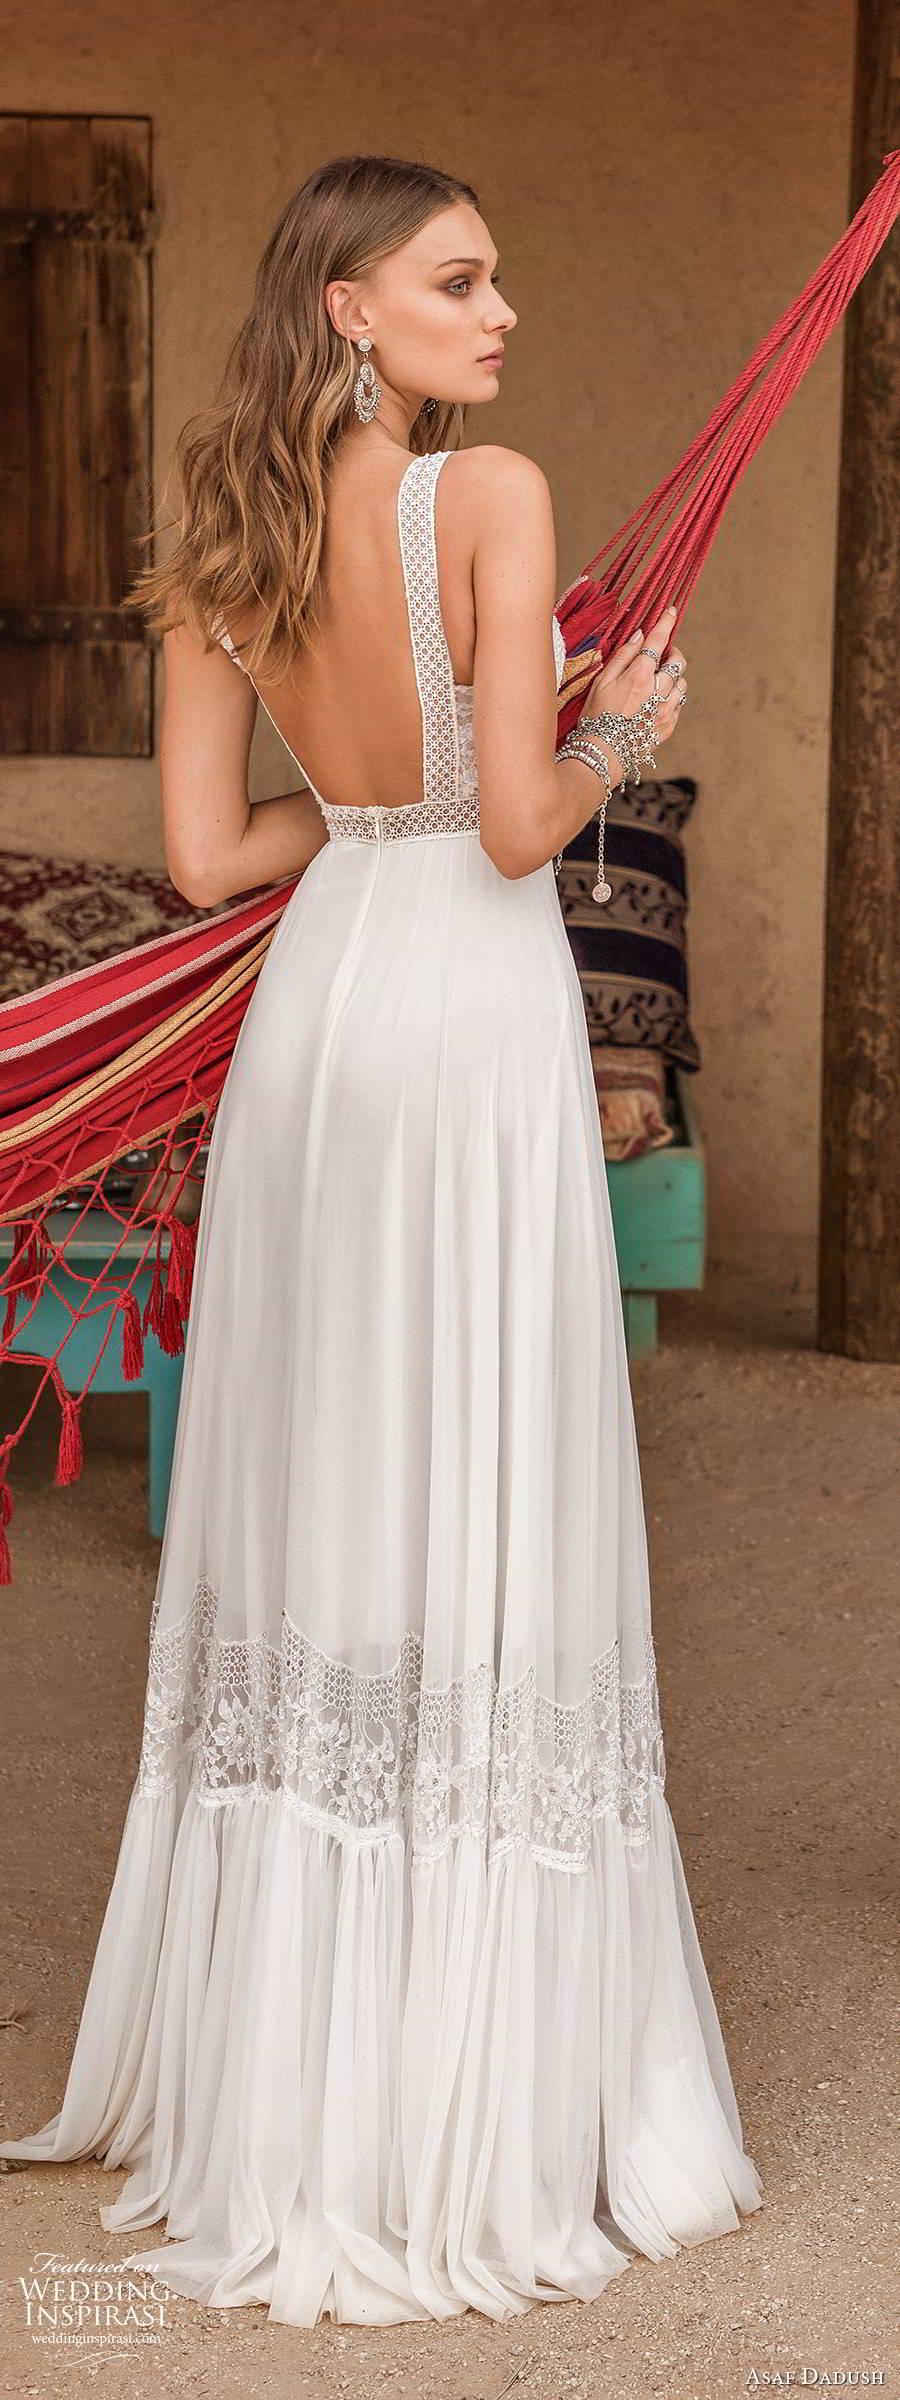 asaf dadush 2019 bridal sleeveless thick straps v neckline embellished bodice romantic a line ball gown wedding dress (3) bv